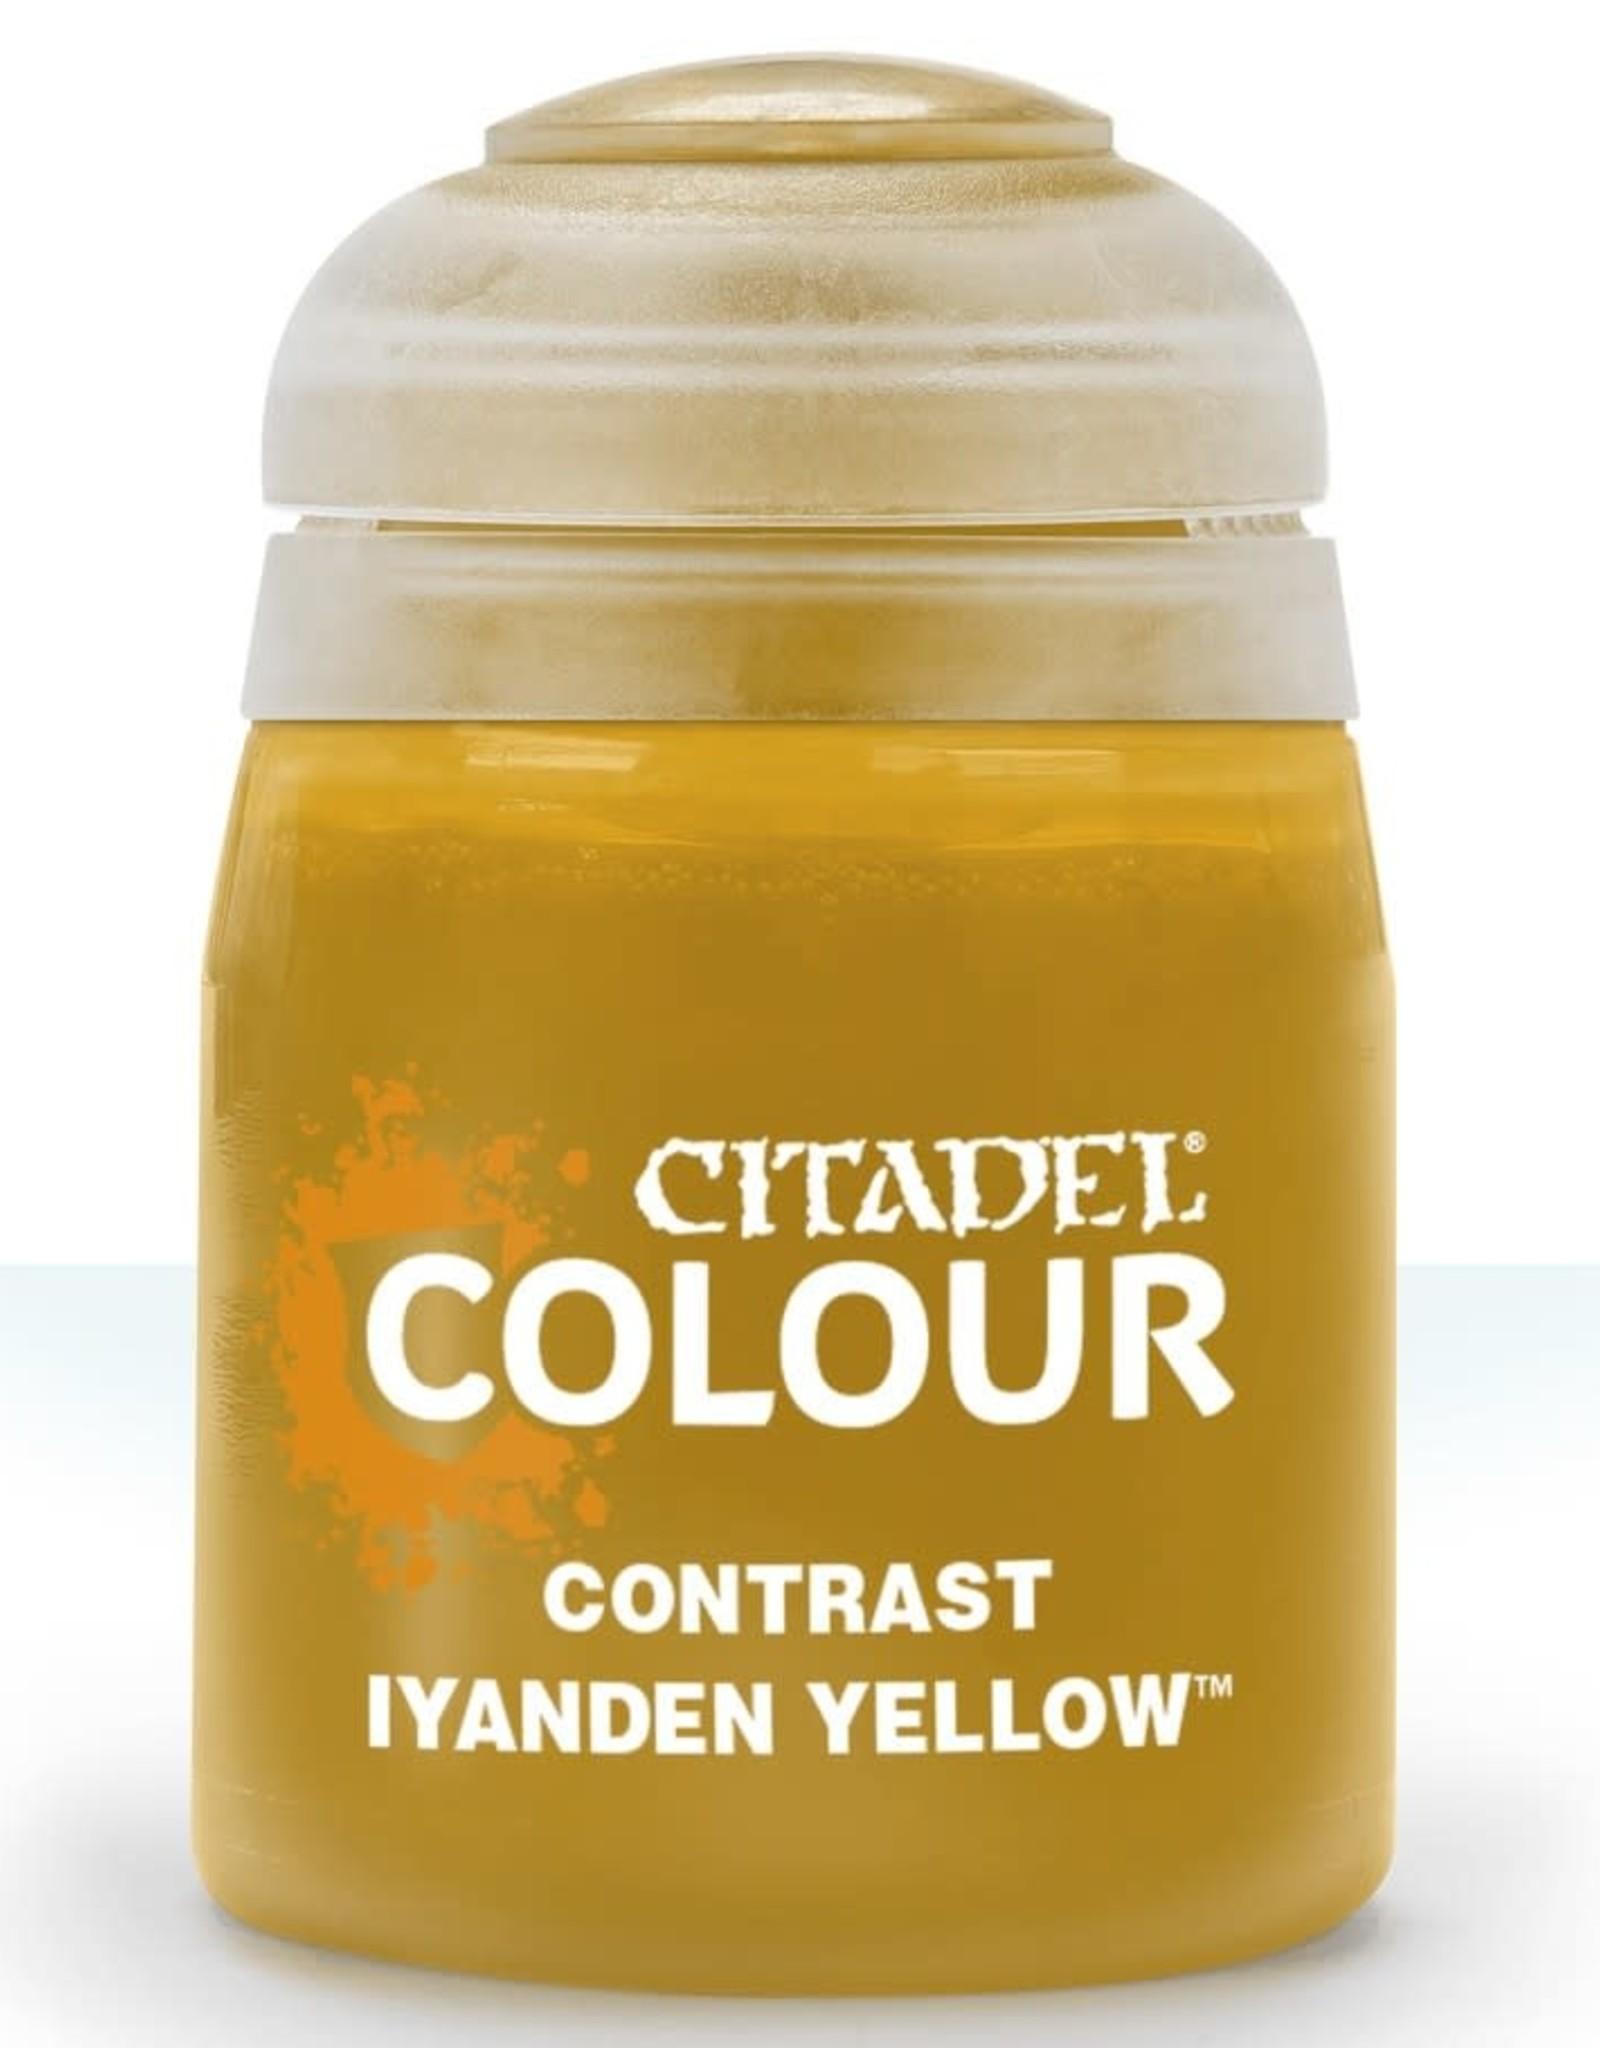 Citadel Contrast Paint: Iyanden Yellow